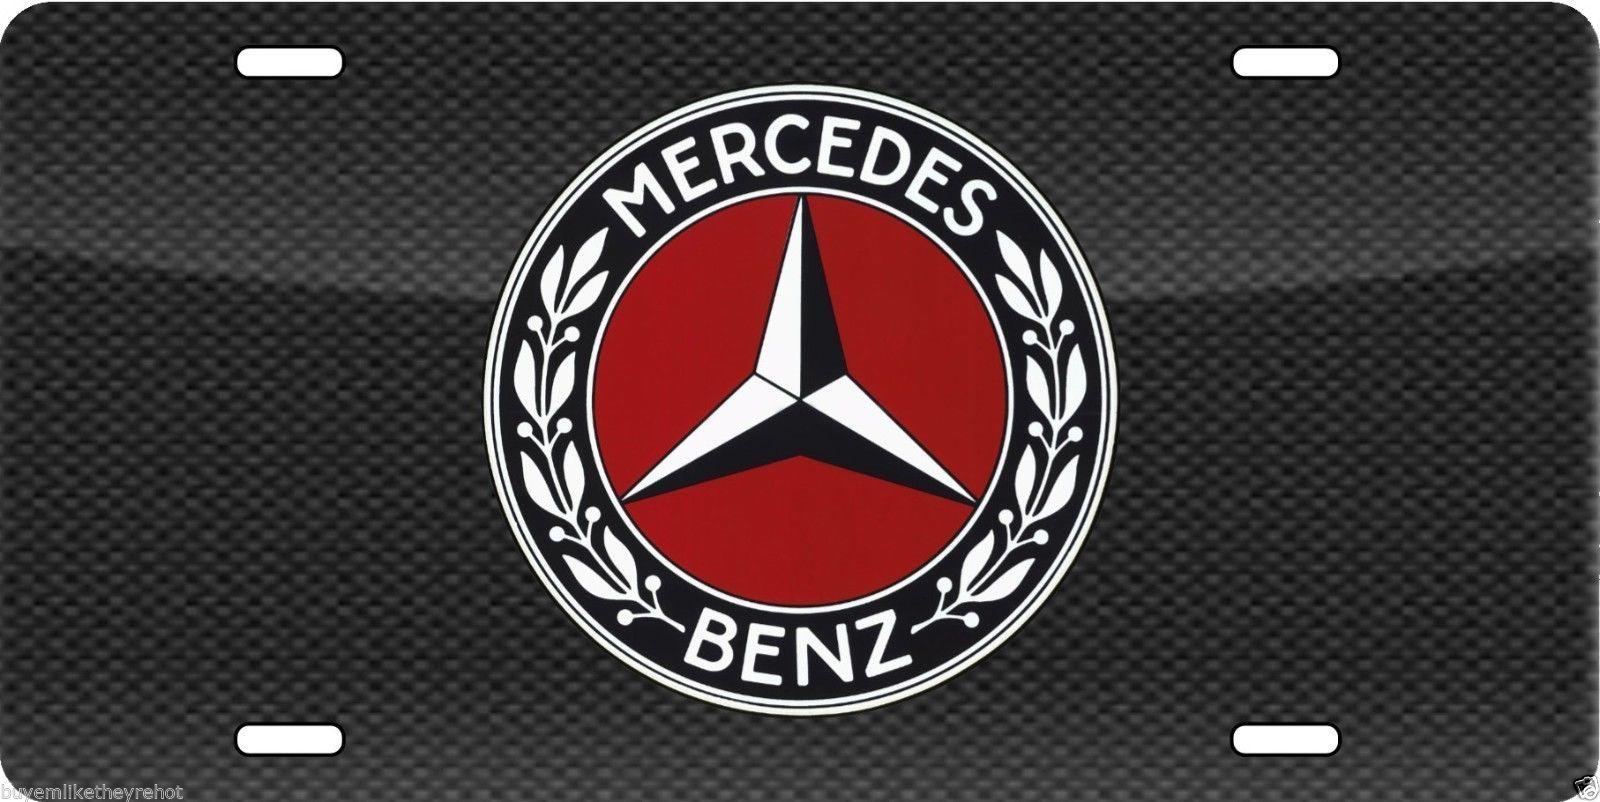 Mercedes benz aluminum vanity license plate vintage emblem for Mercedes benz vanity license plates